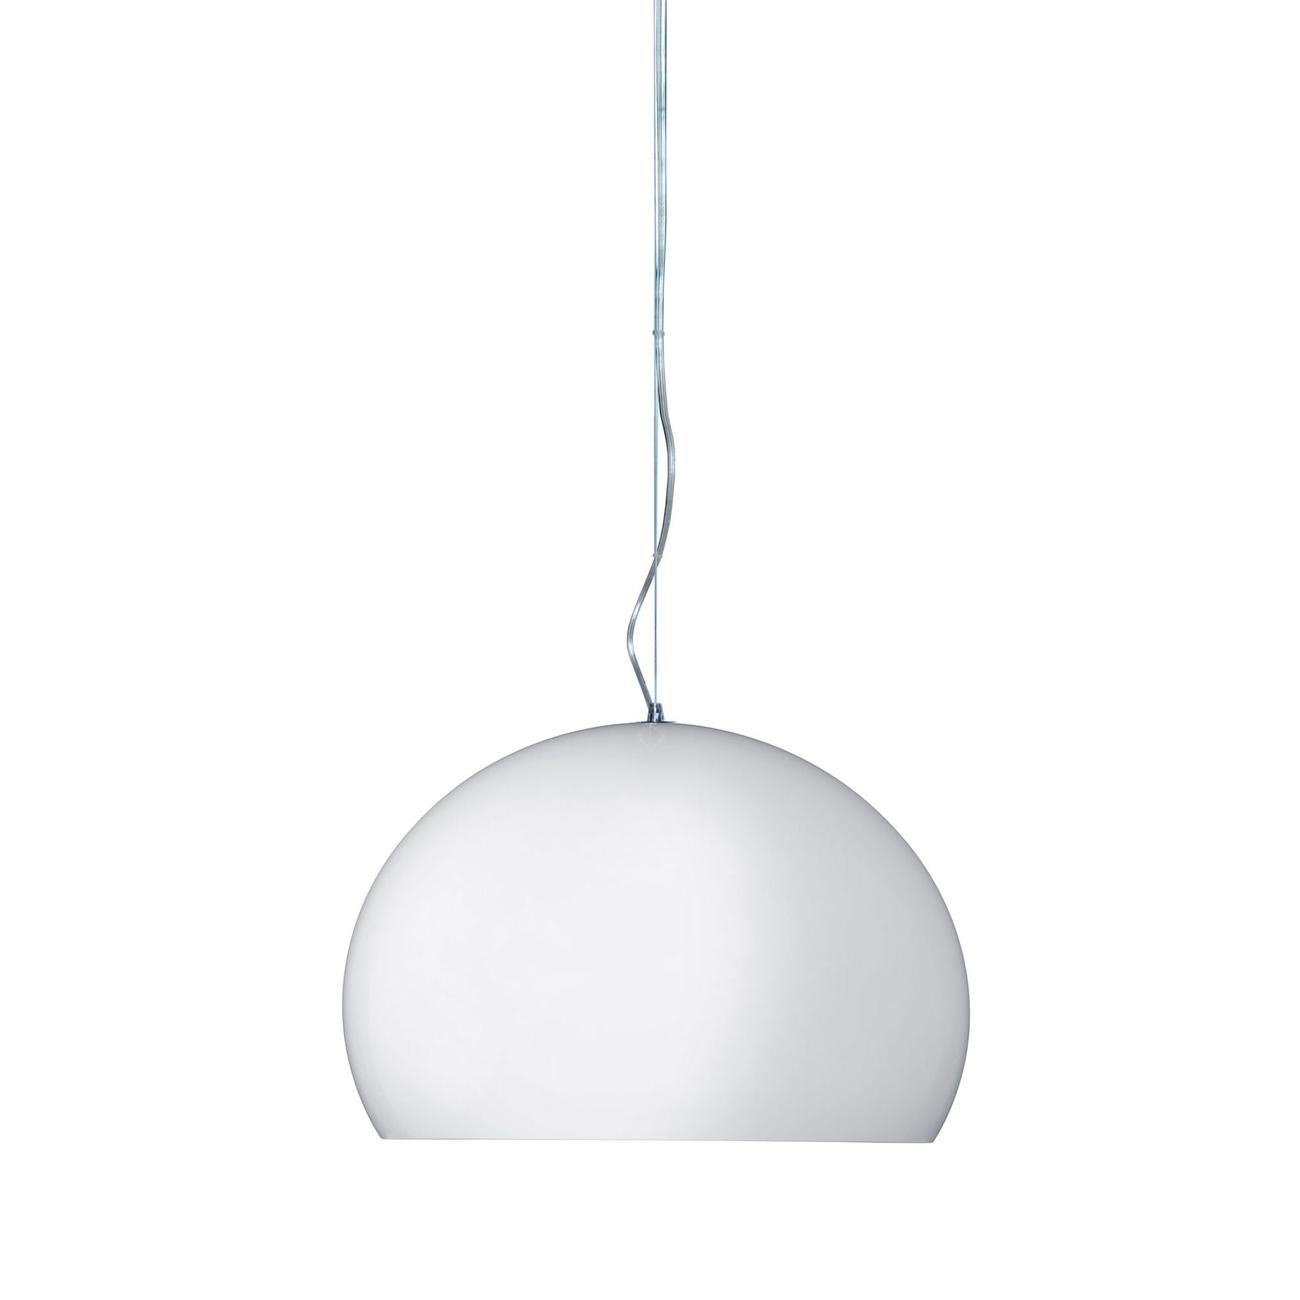 Kartell Small Fly LED hanglamp-Wit-glans